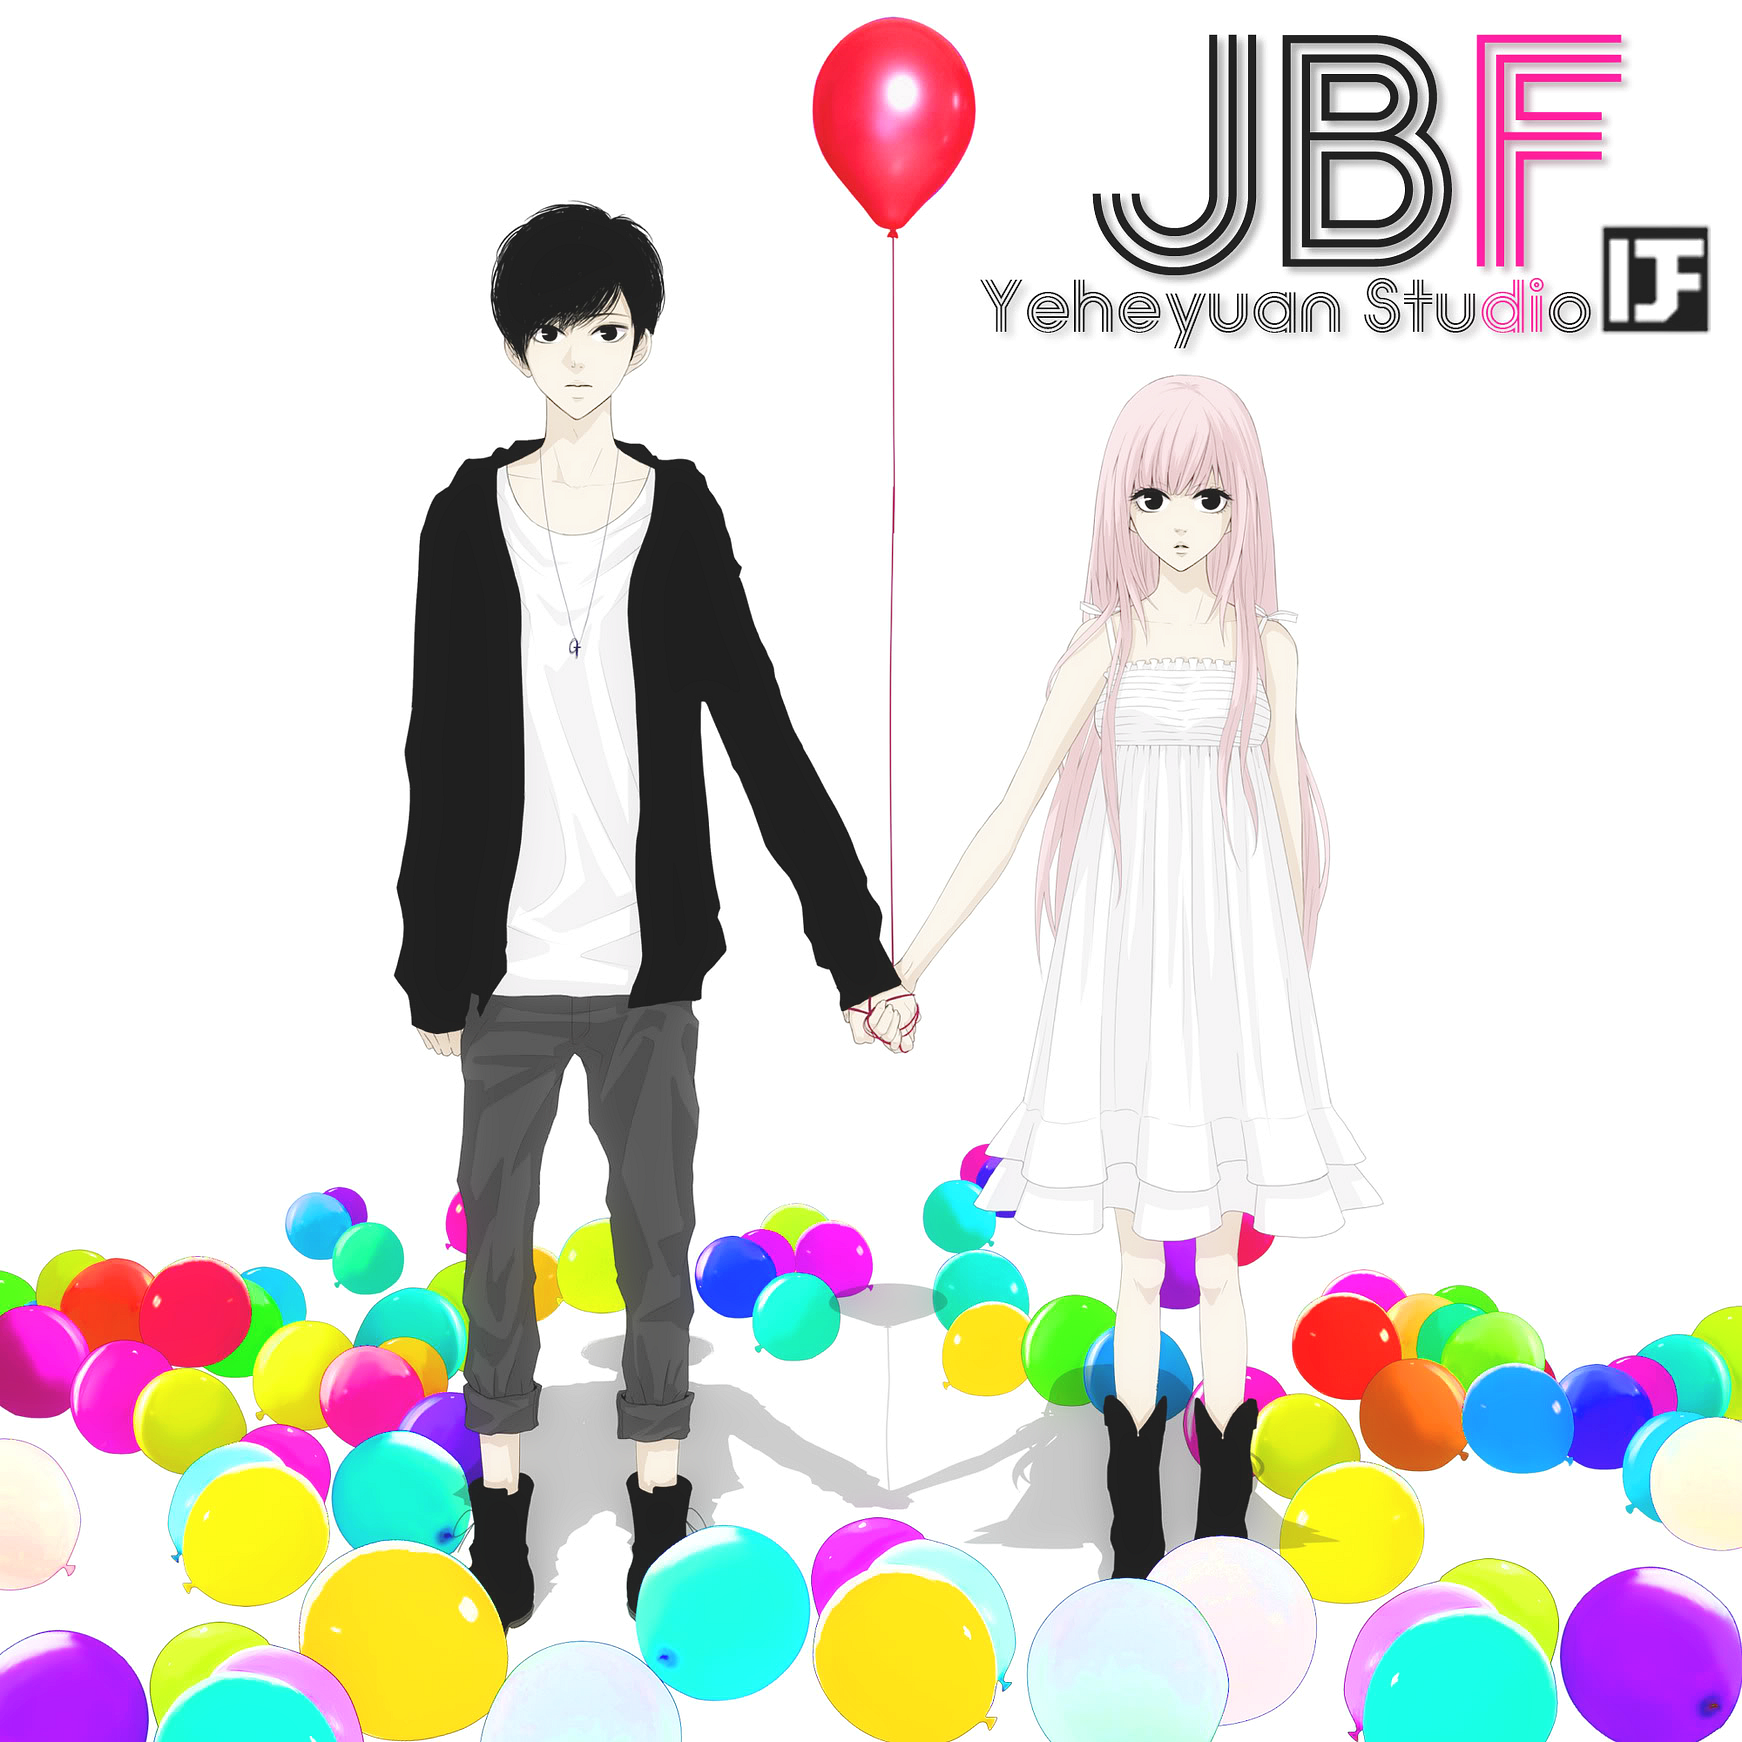 Just Be Friends   Vocaloid Lyrics Wiki   FANDOM powered by Wikia